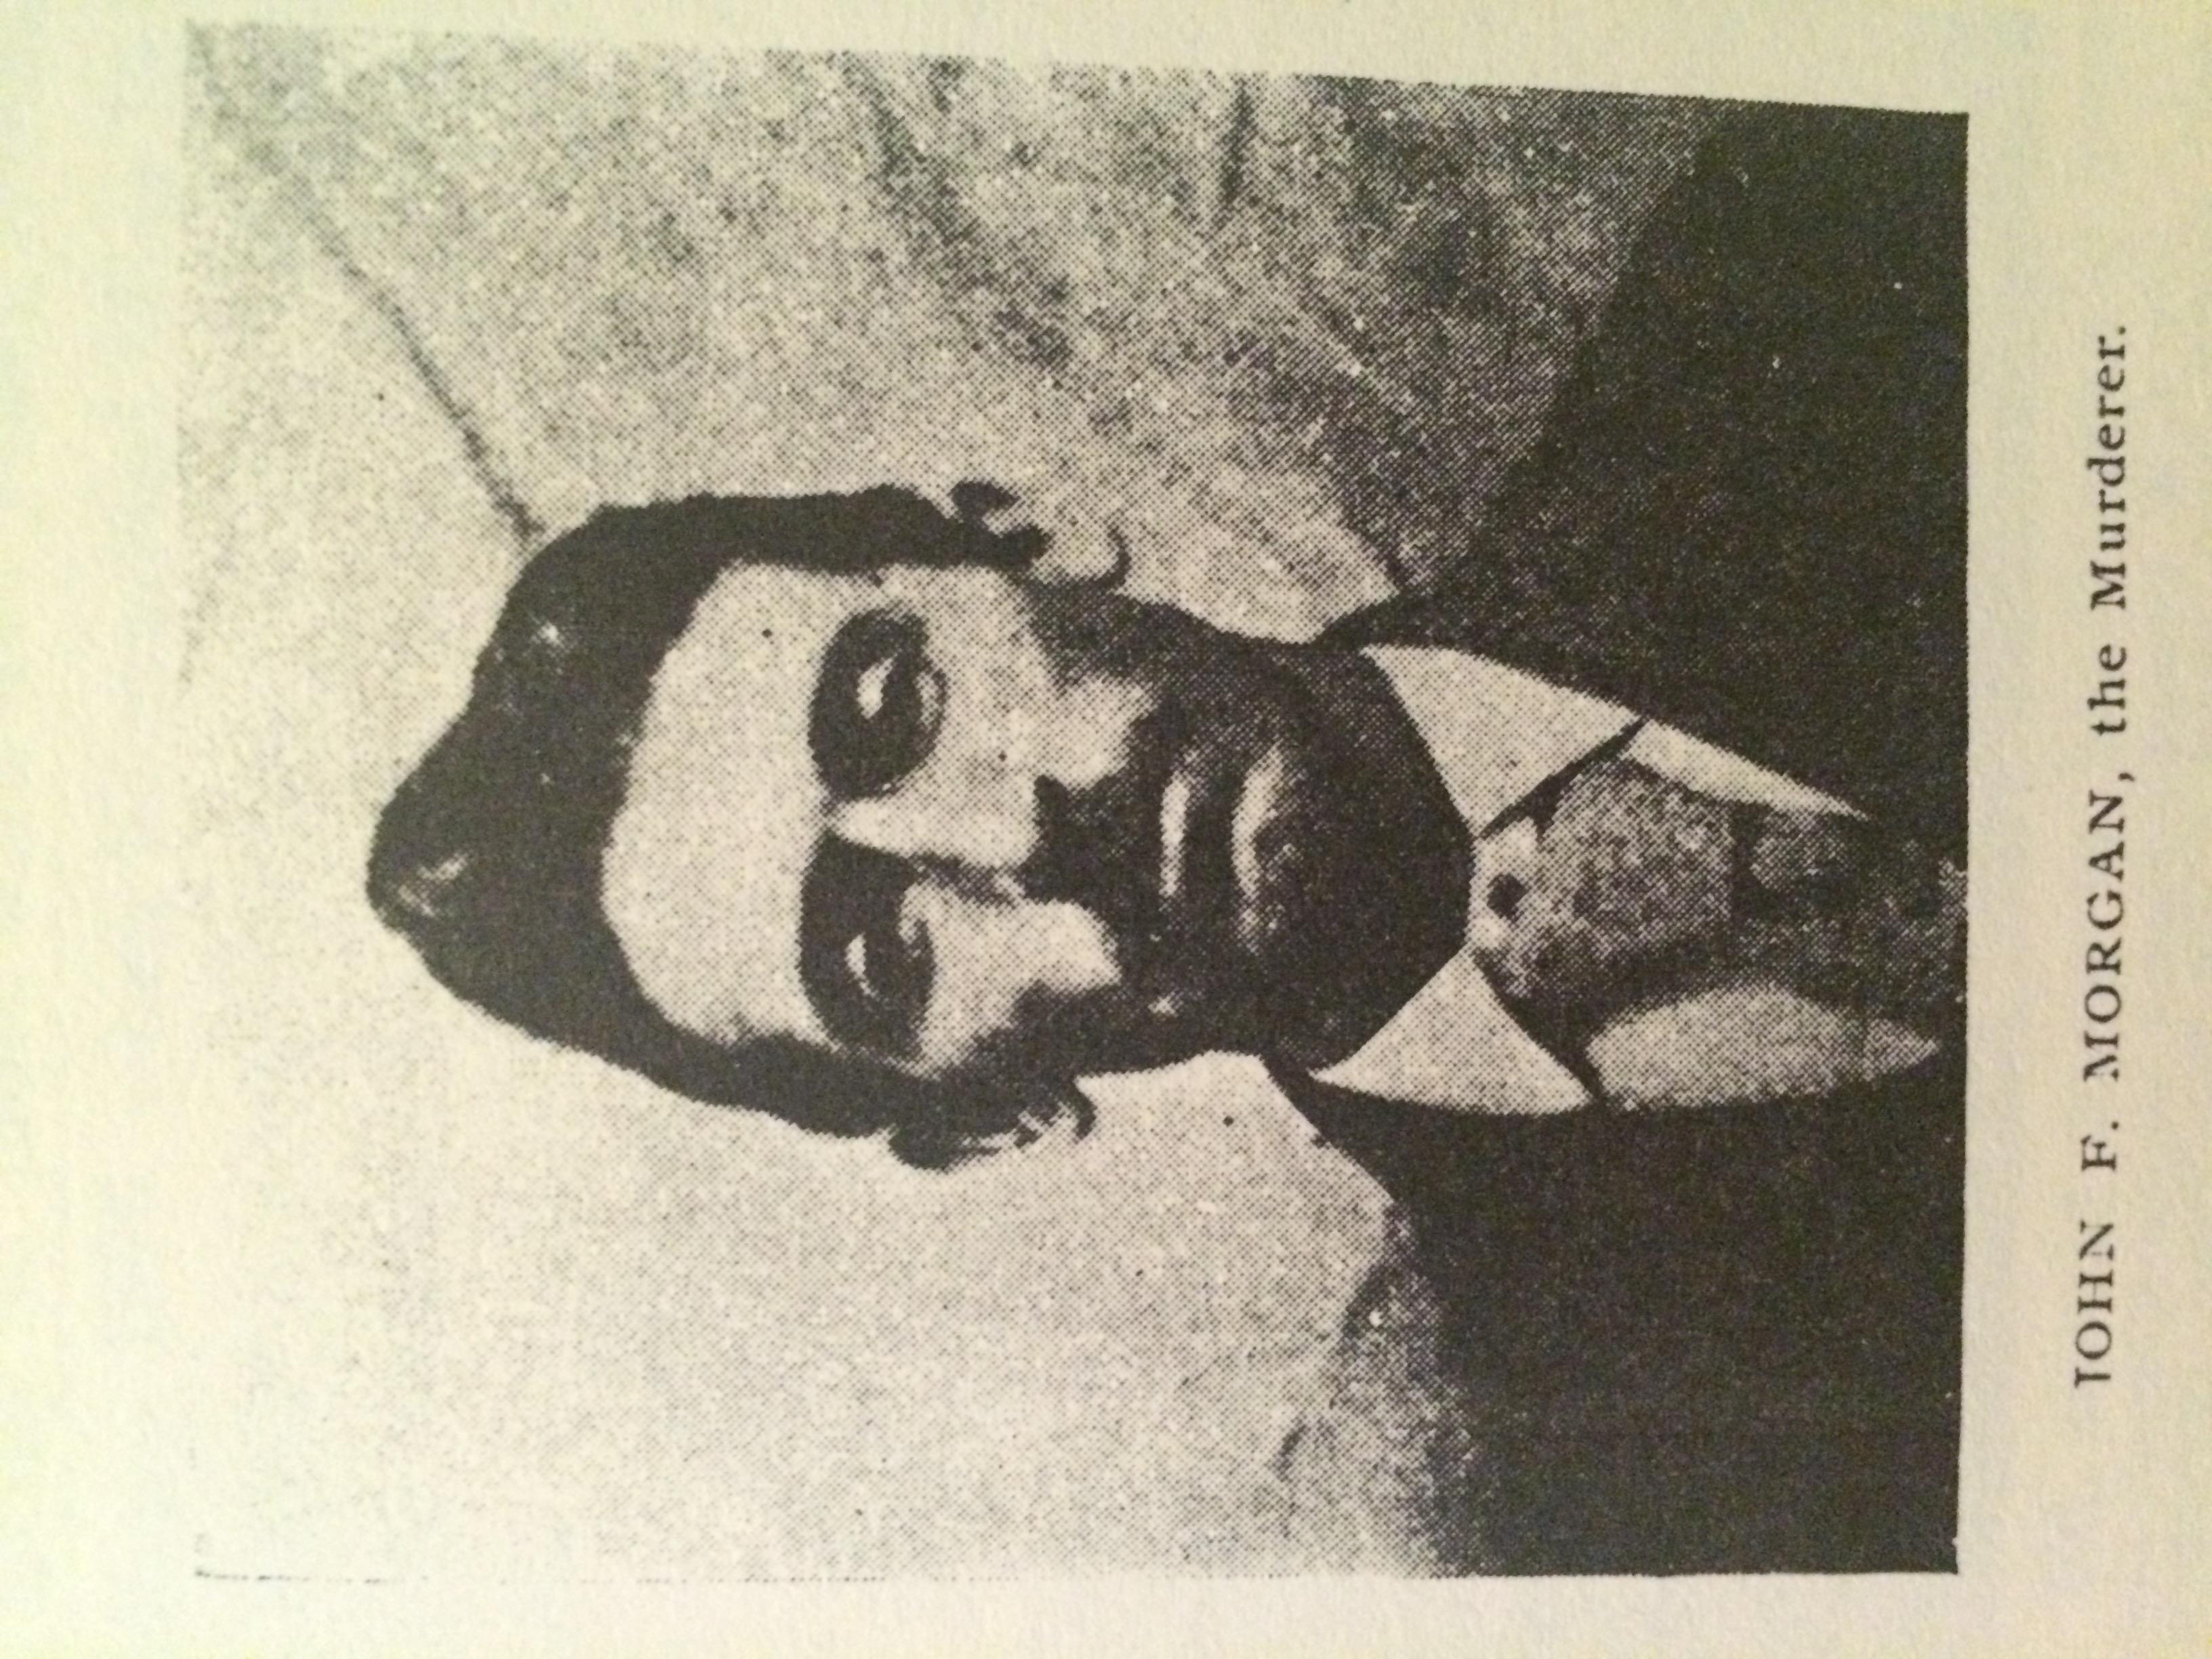 Image of John F. Morgan taken from Morrison's pamphlet